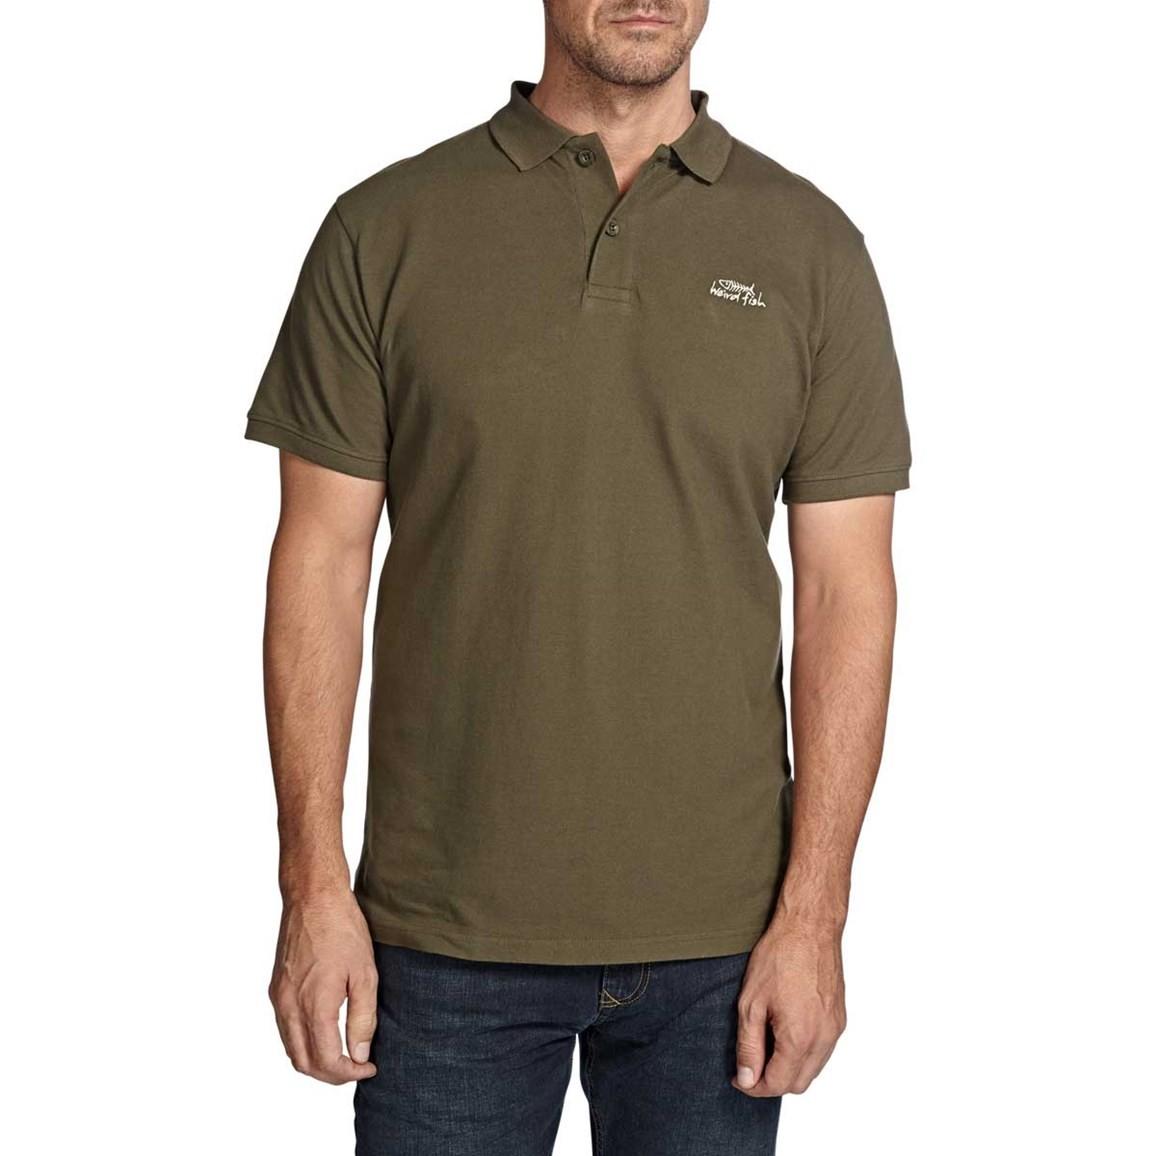 Saltash Plain Rib Collar Pique Polo Shirt Olive Night